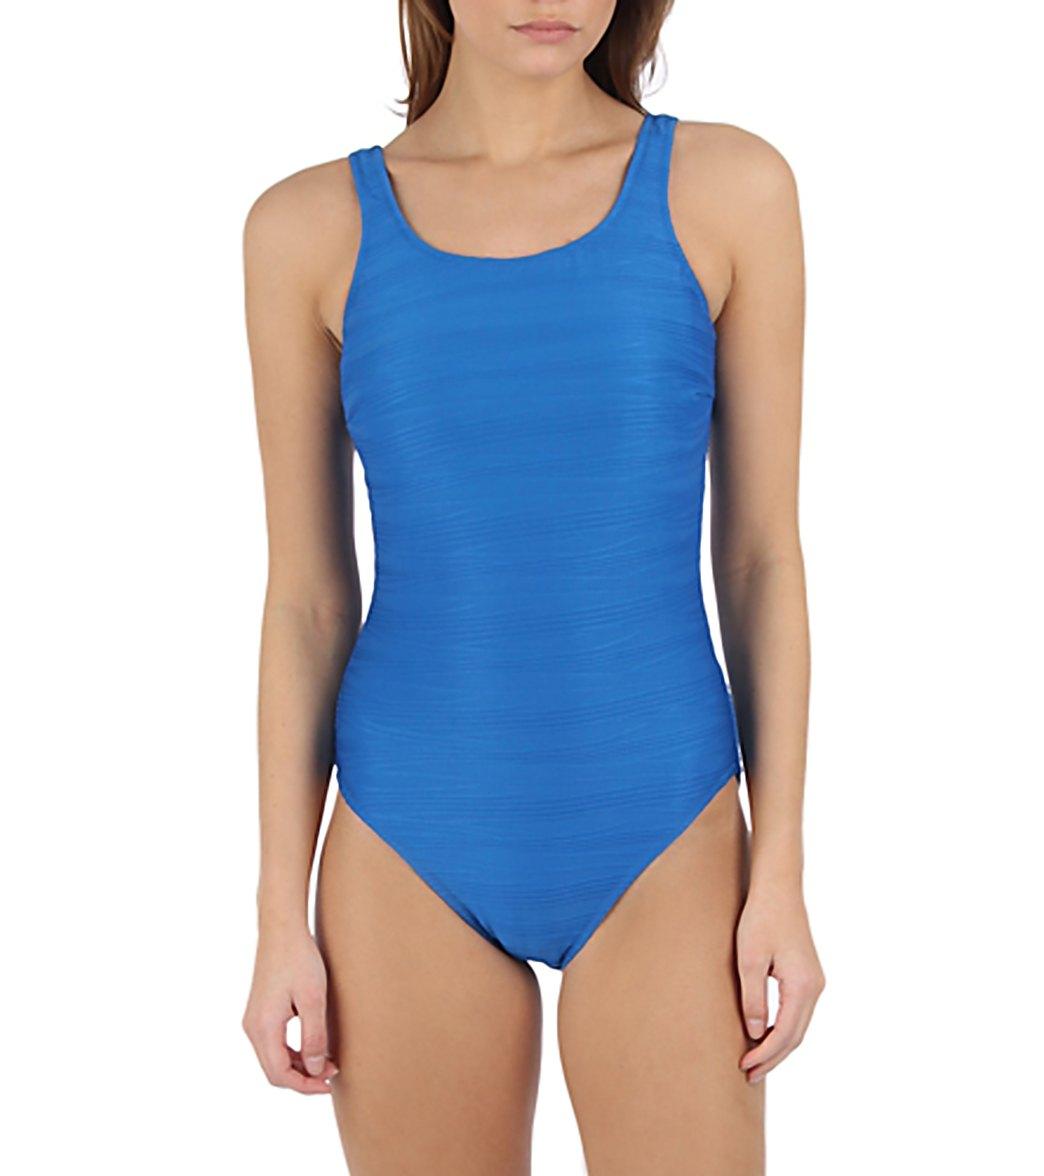 850386e77925b Gottex Mikado Mastectomy High Neck Tank One Piece Swimsuit at ...